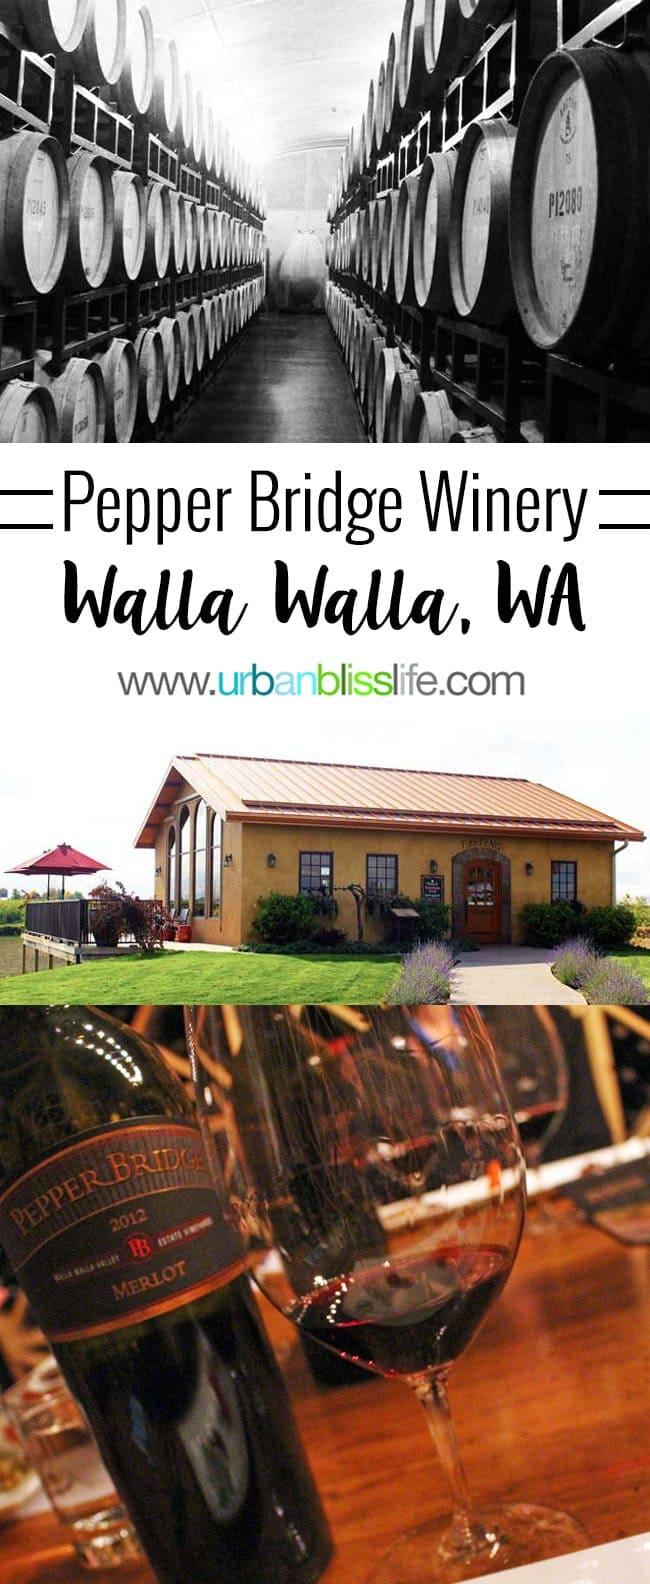 Barrels at Pepper Bridge Winery in Walla Walla, Washington